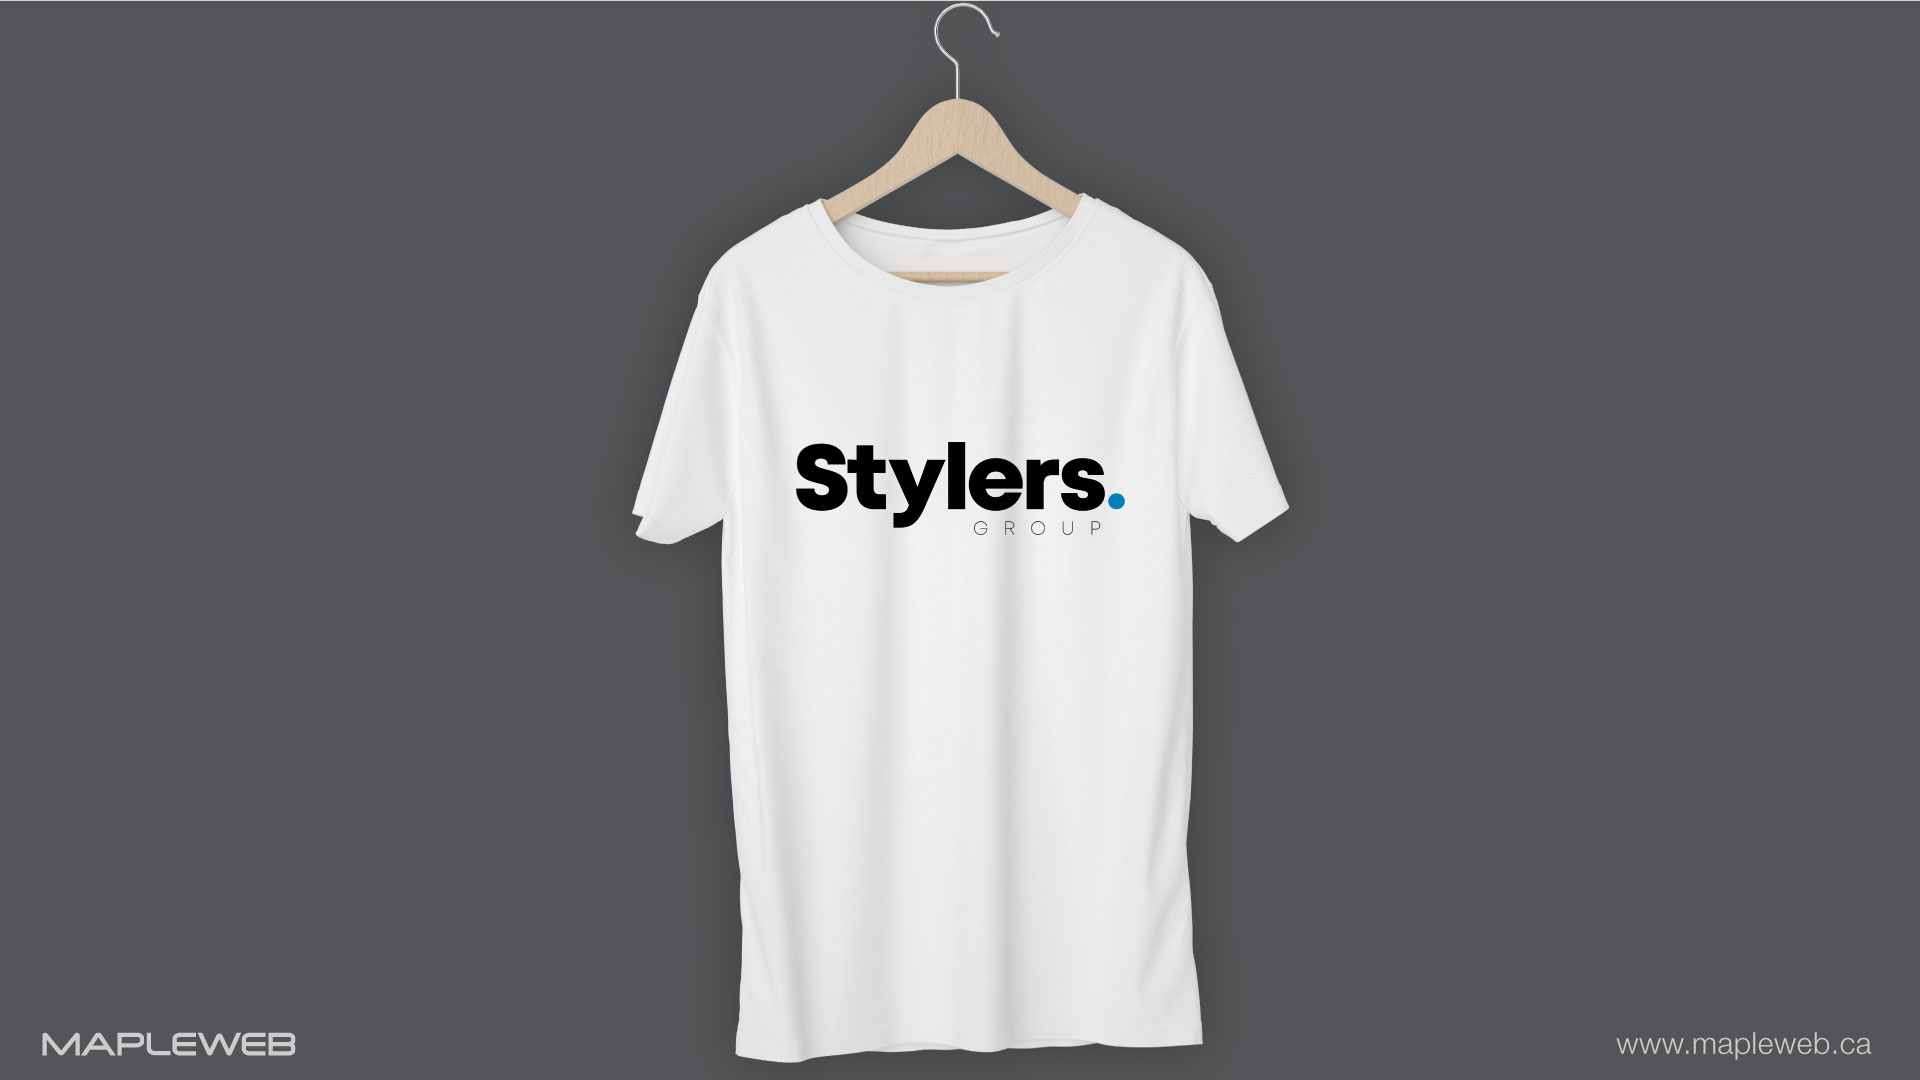 stylers-group-brand-logo-design-by-mapleweb-vancouver-canada-white-mug-mock